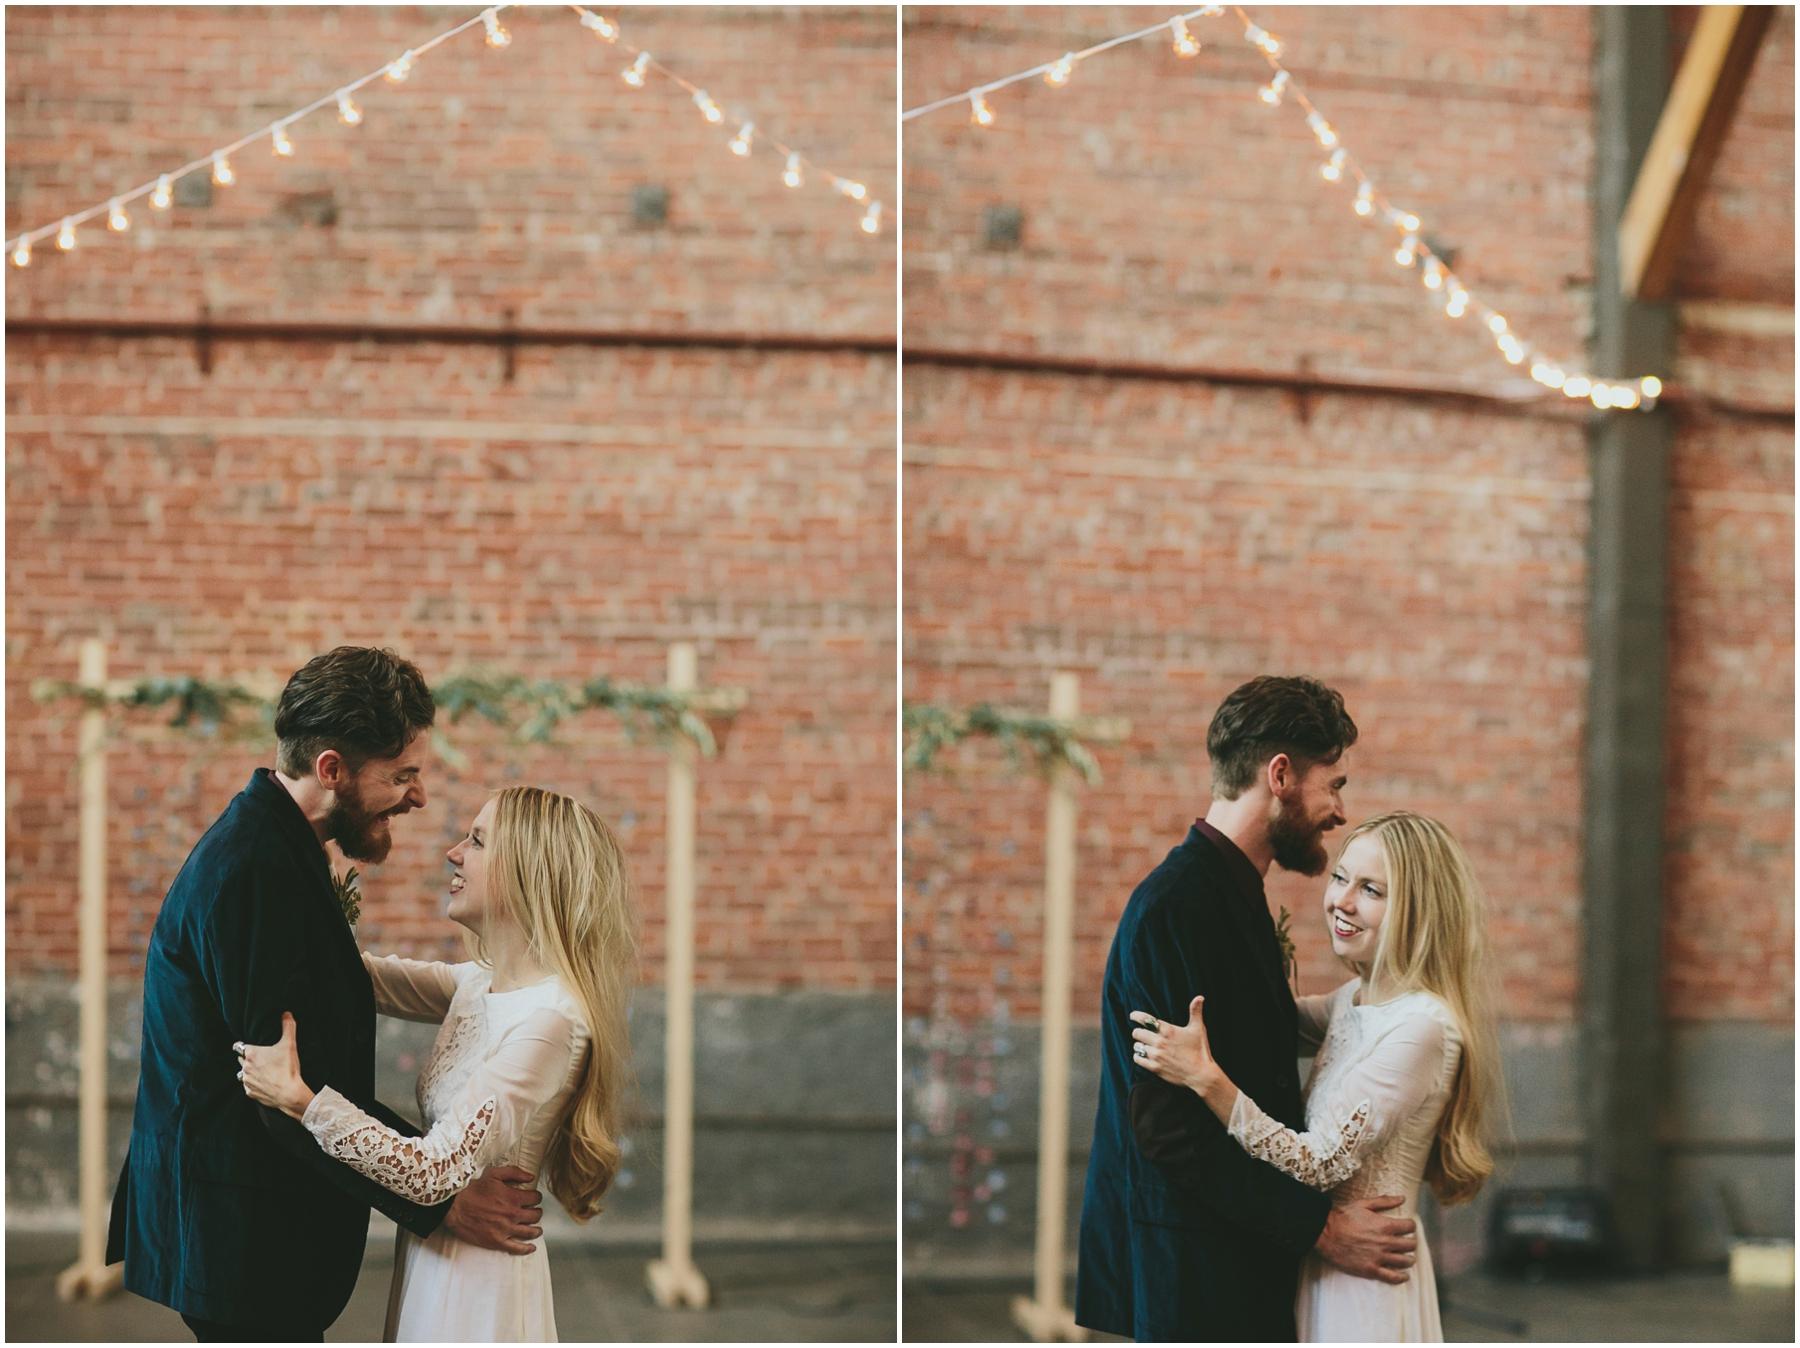 Natalie+Corey-WEDDING_KELLYBOITANO_0103